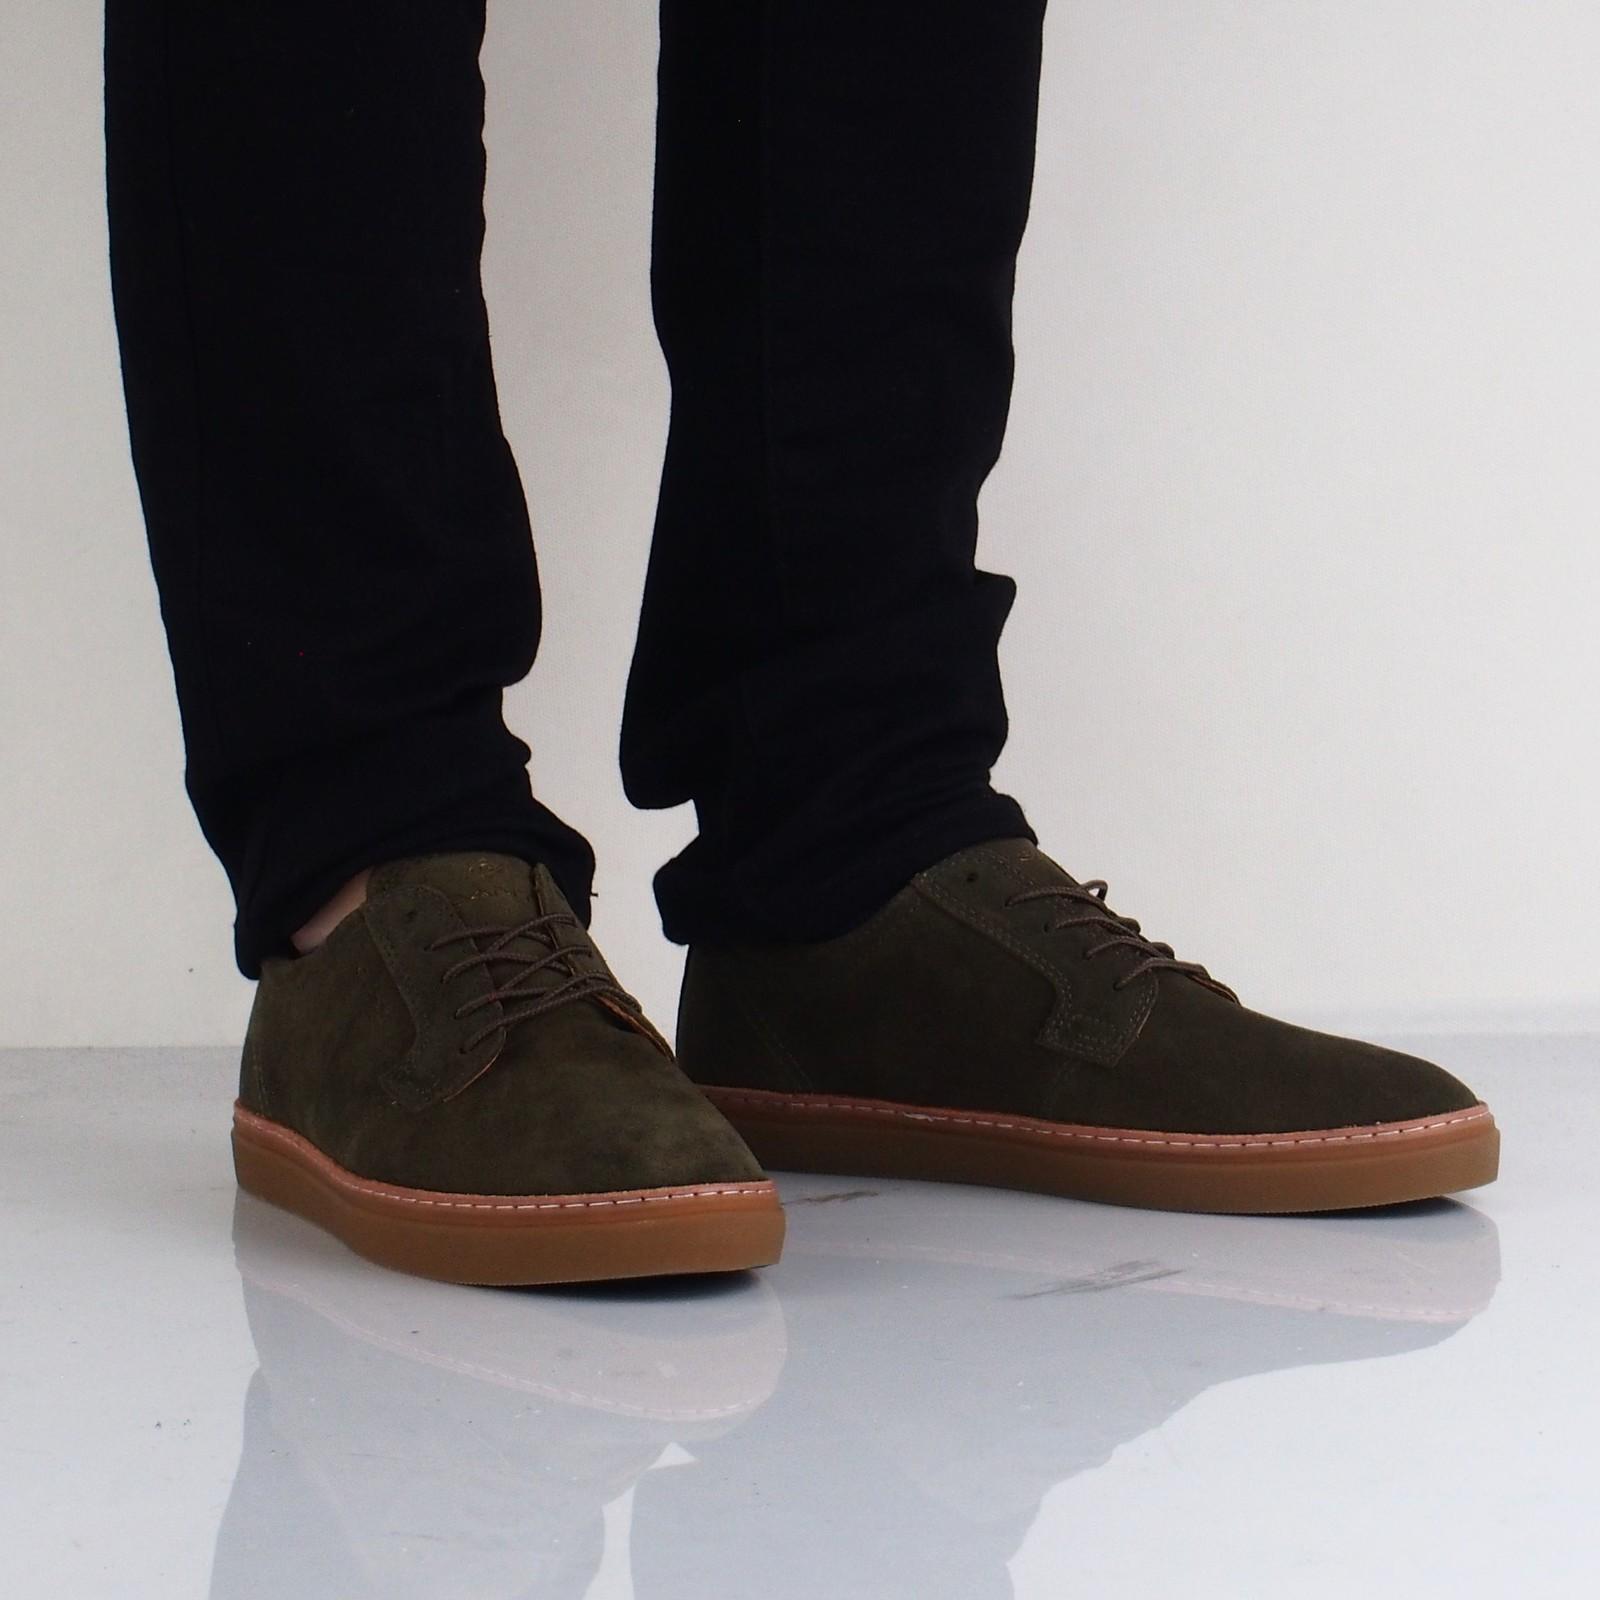 Gant pánske semišové štýlové tenisky - olivové